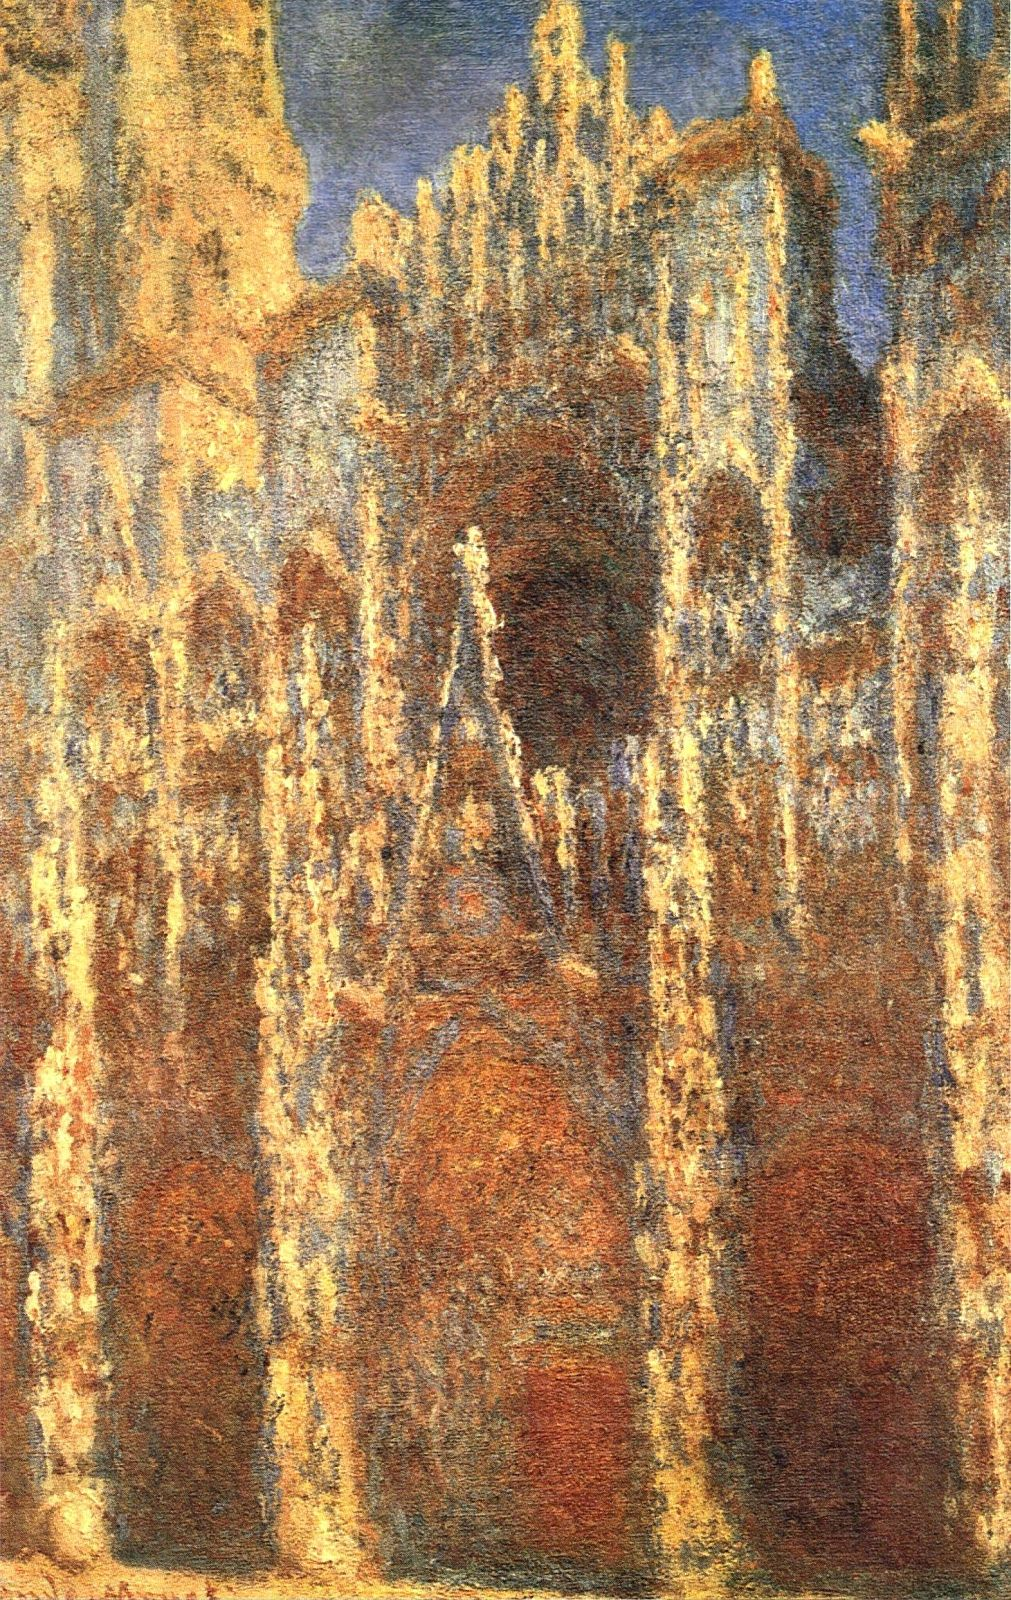 Rouen Cathedral, the Portal, 1894 Claude Monet